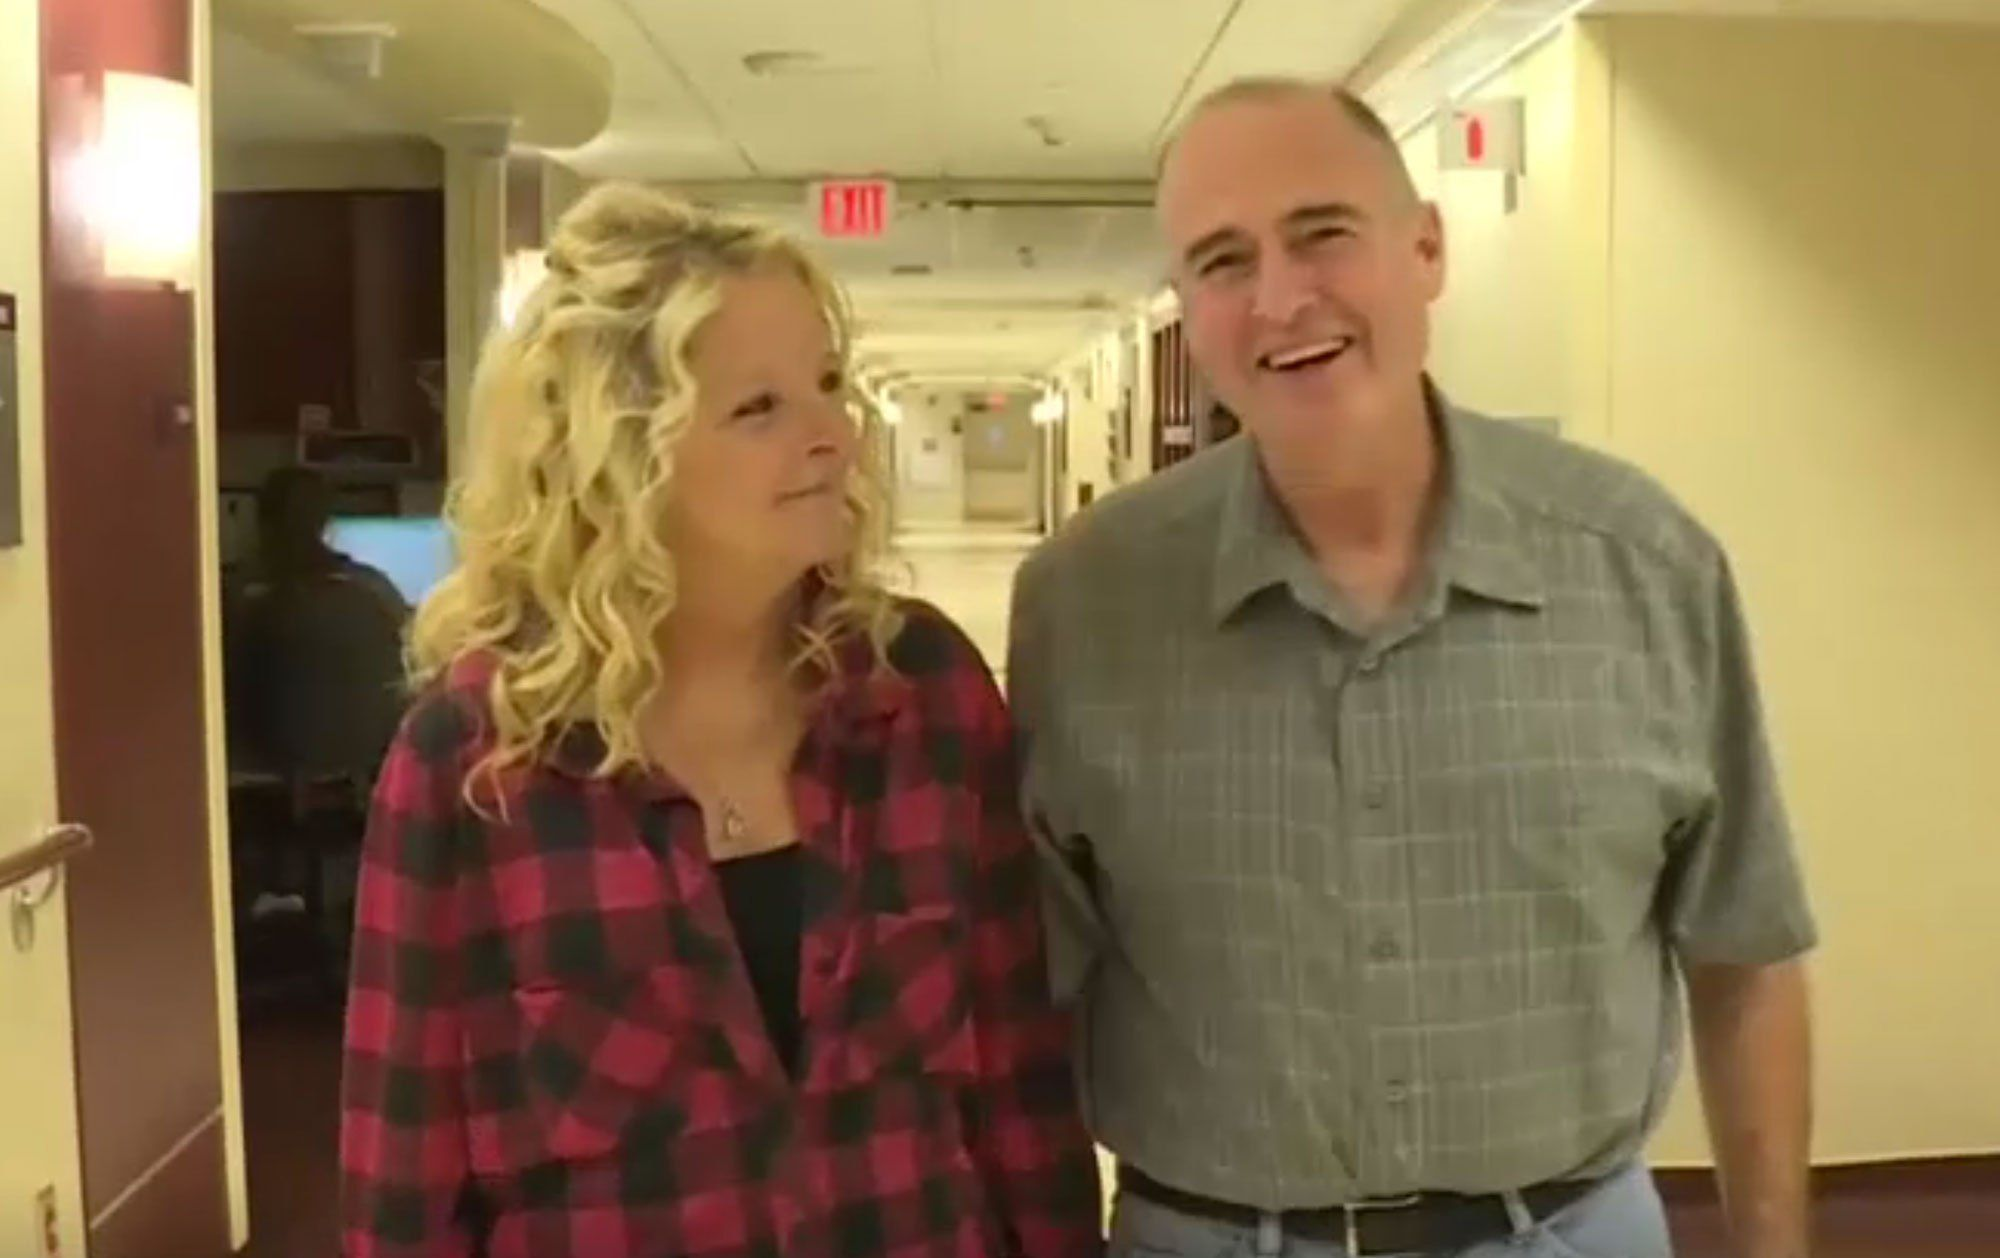 Debbie Lewis and Bill Corey